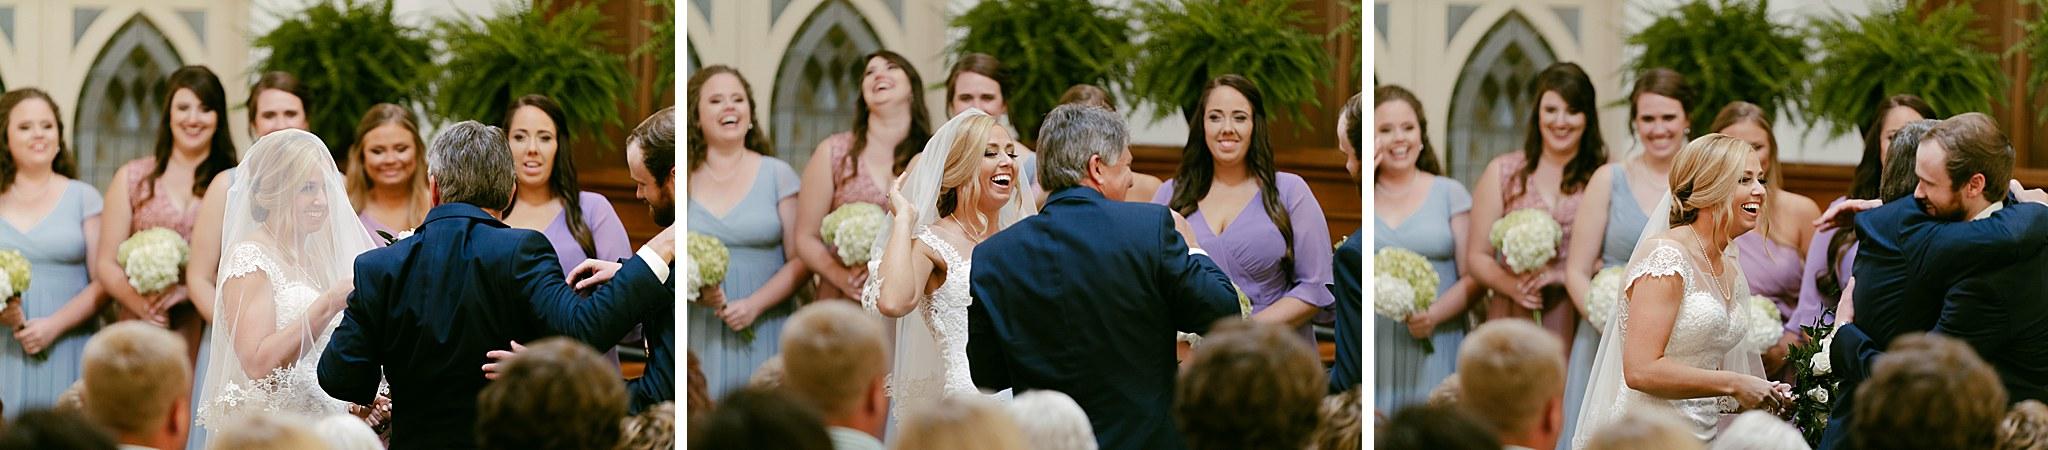 Williamston-NC-Wedding-Photographer 0020.jpg